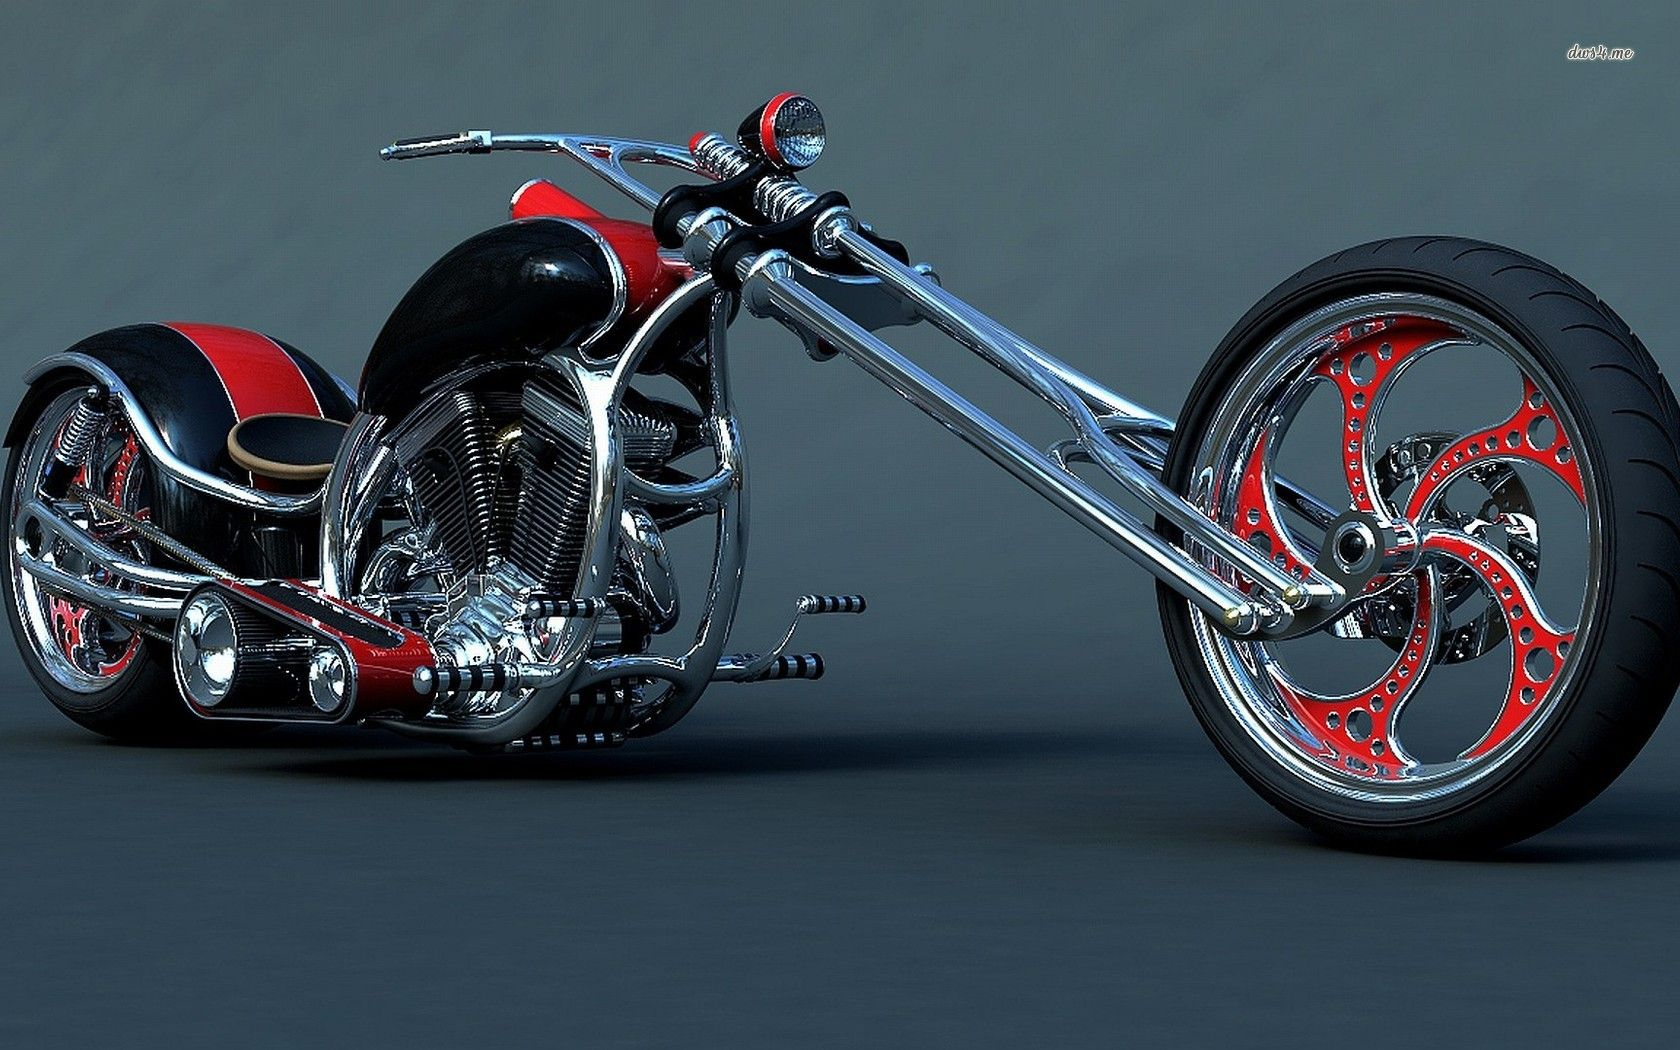 custom harley davidson motorcycles custom harley. Black Bedroom Furniture Sets. Home Design Ideas